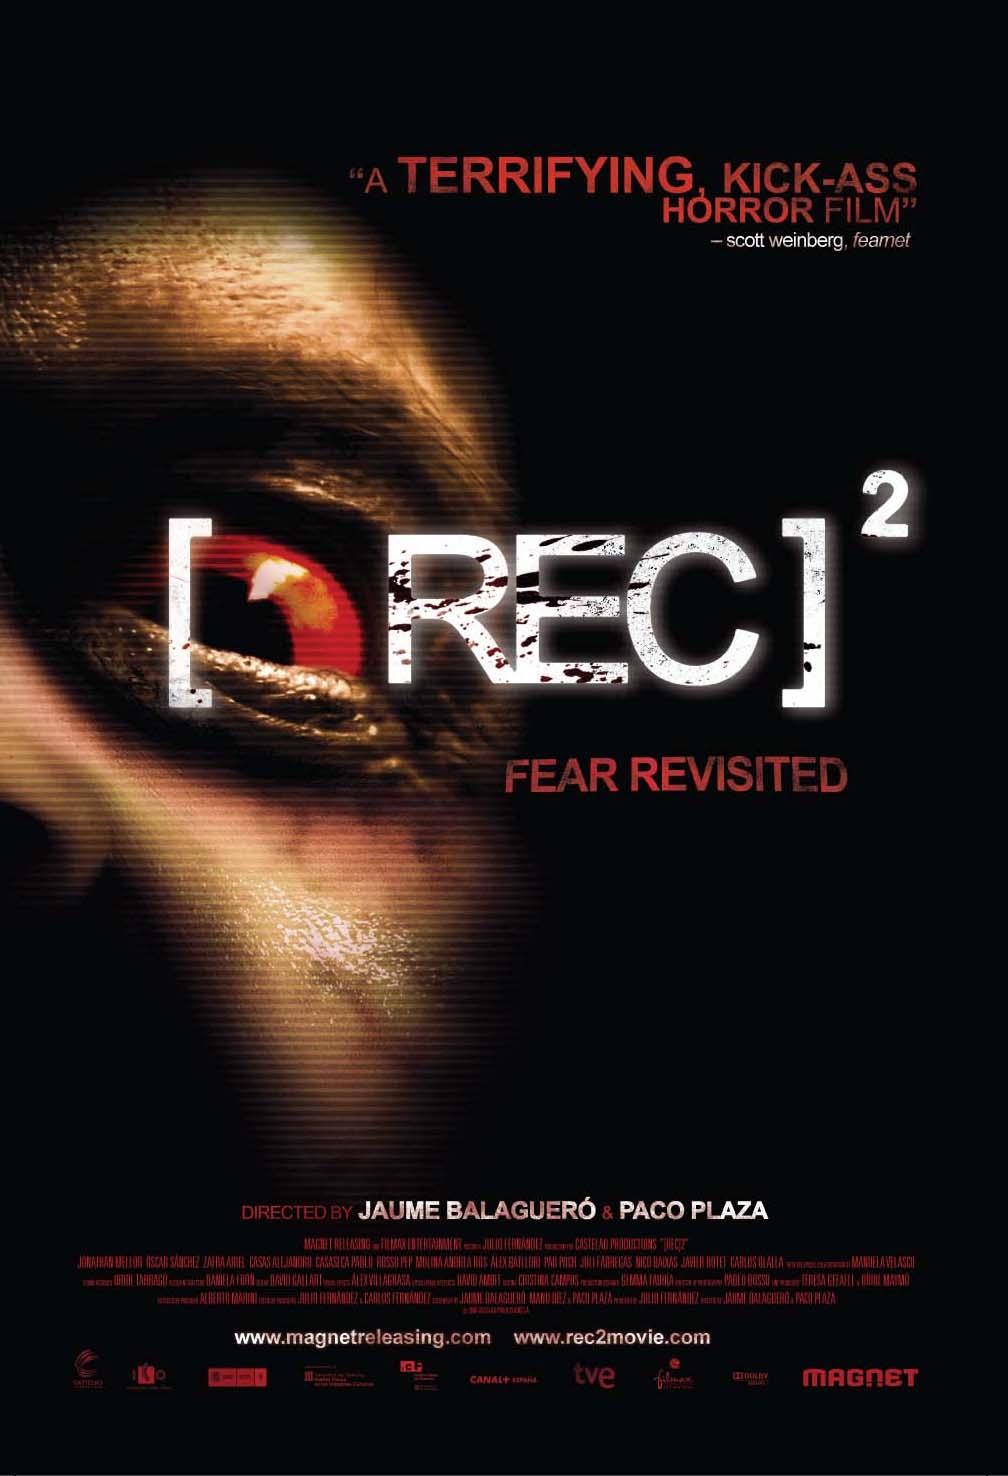 image [Rec]² Watch Full Movie Free Online